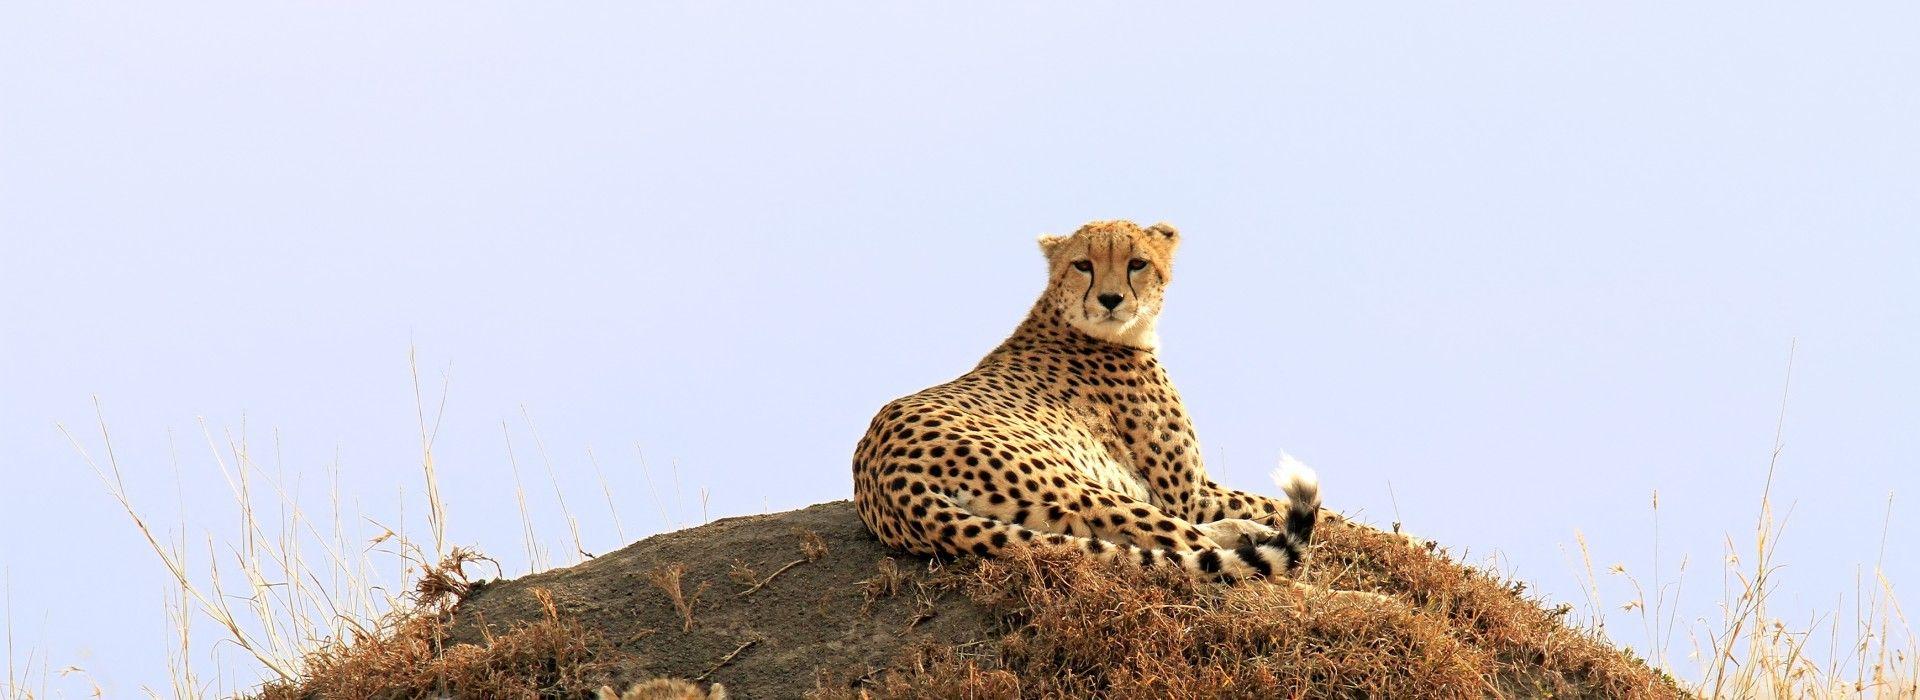 Adventure and sport activities Tours in Africa